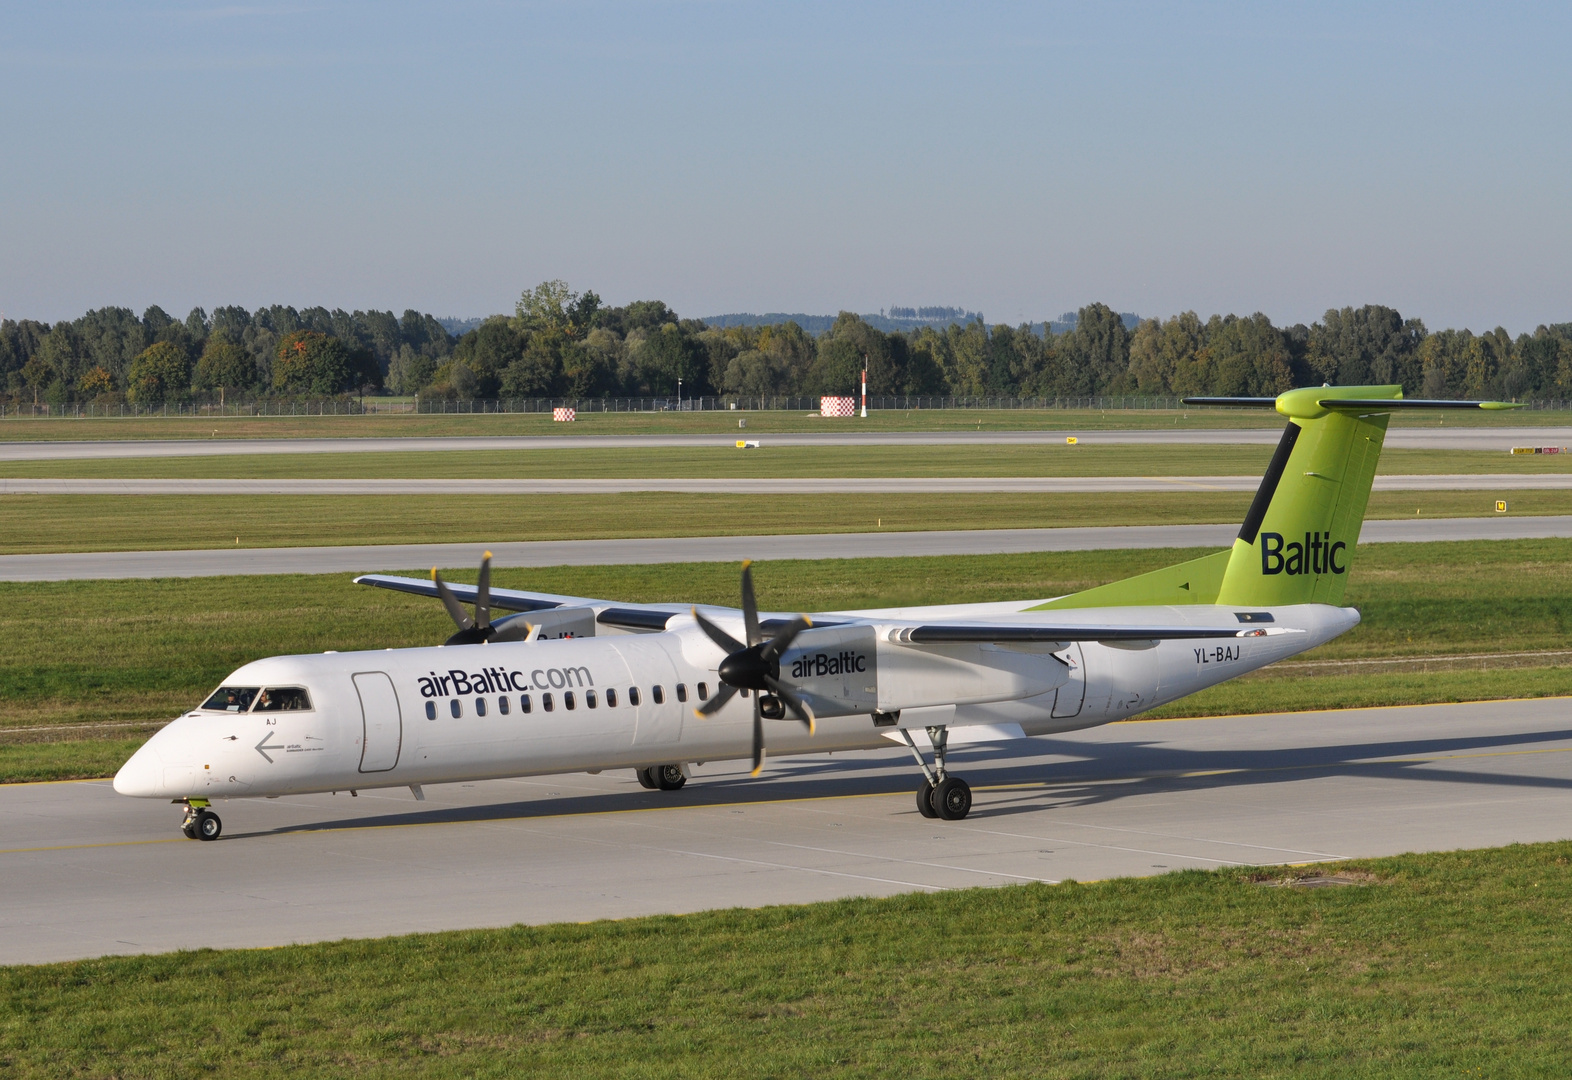 Air Baltic YL-BAJ